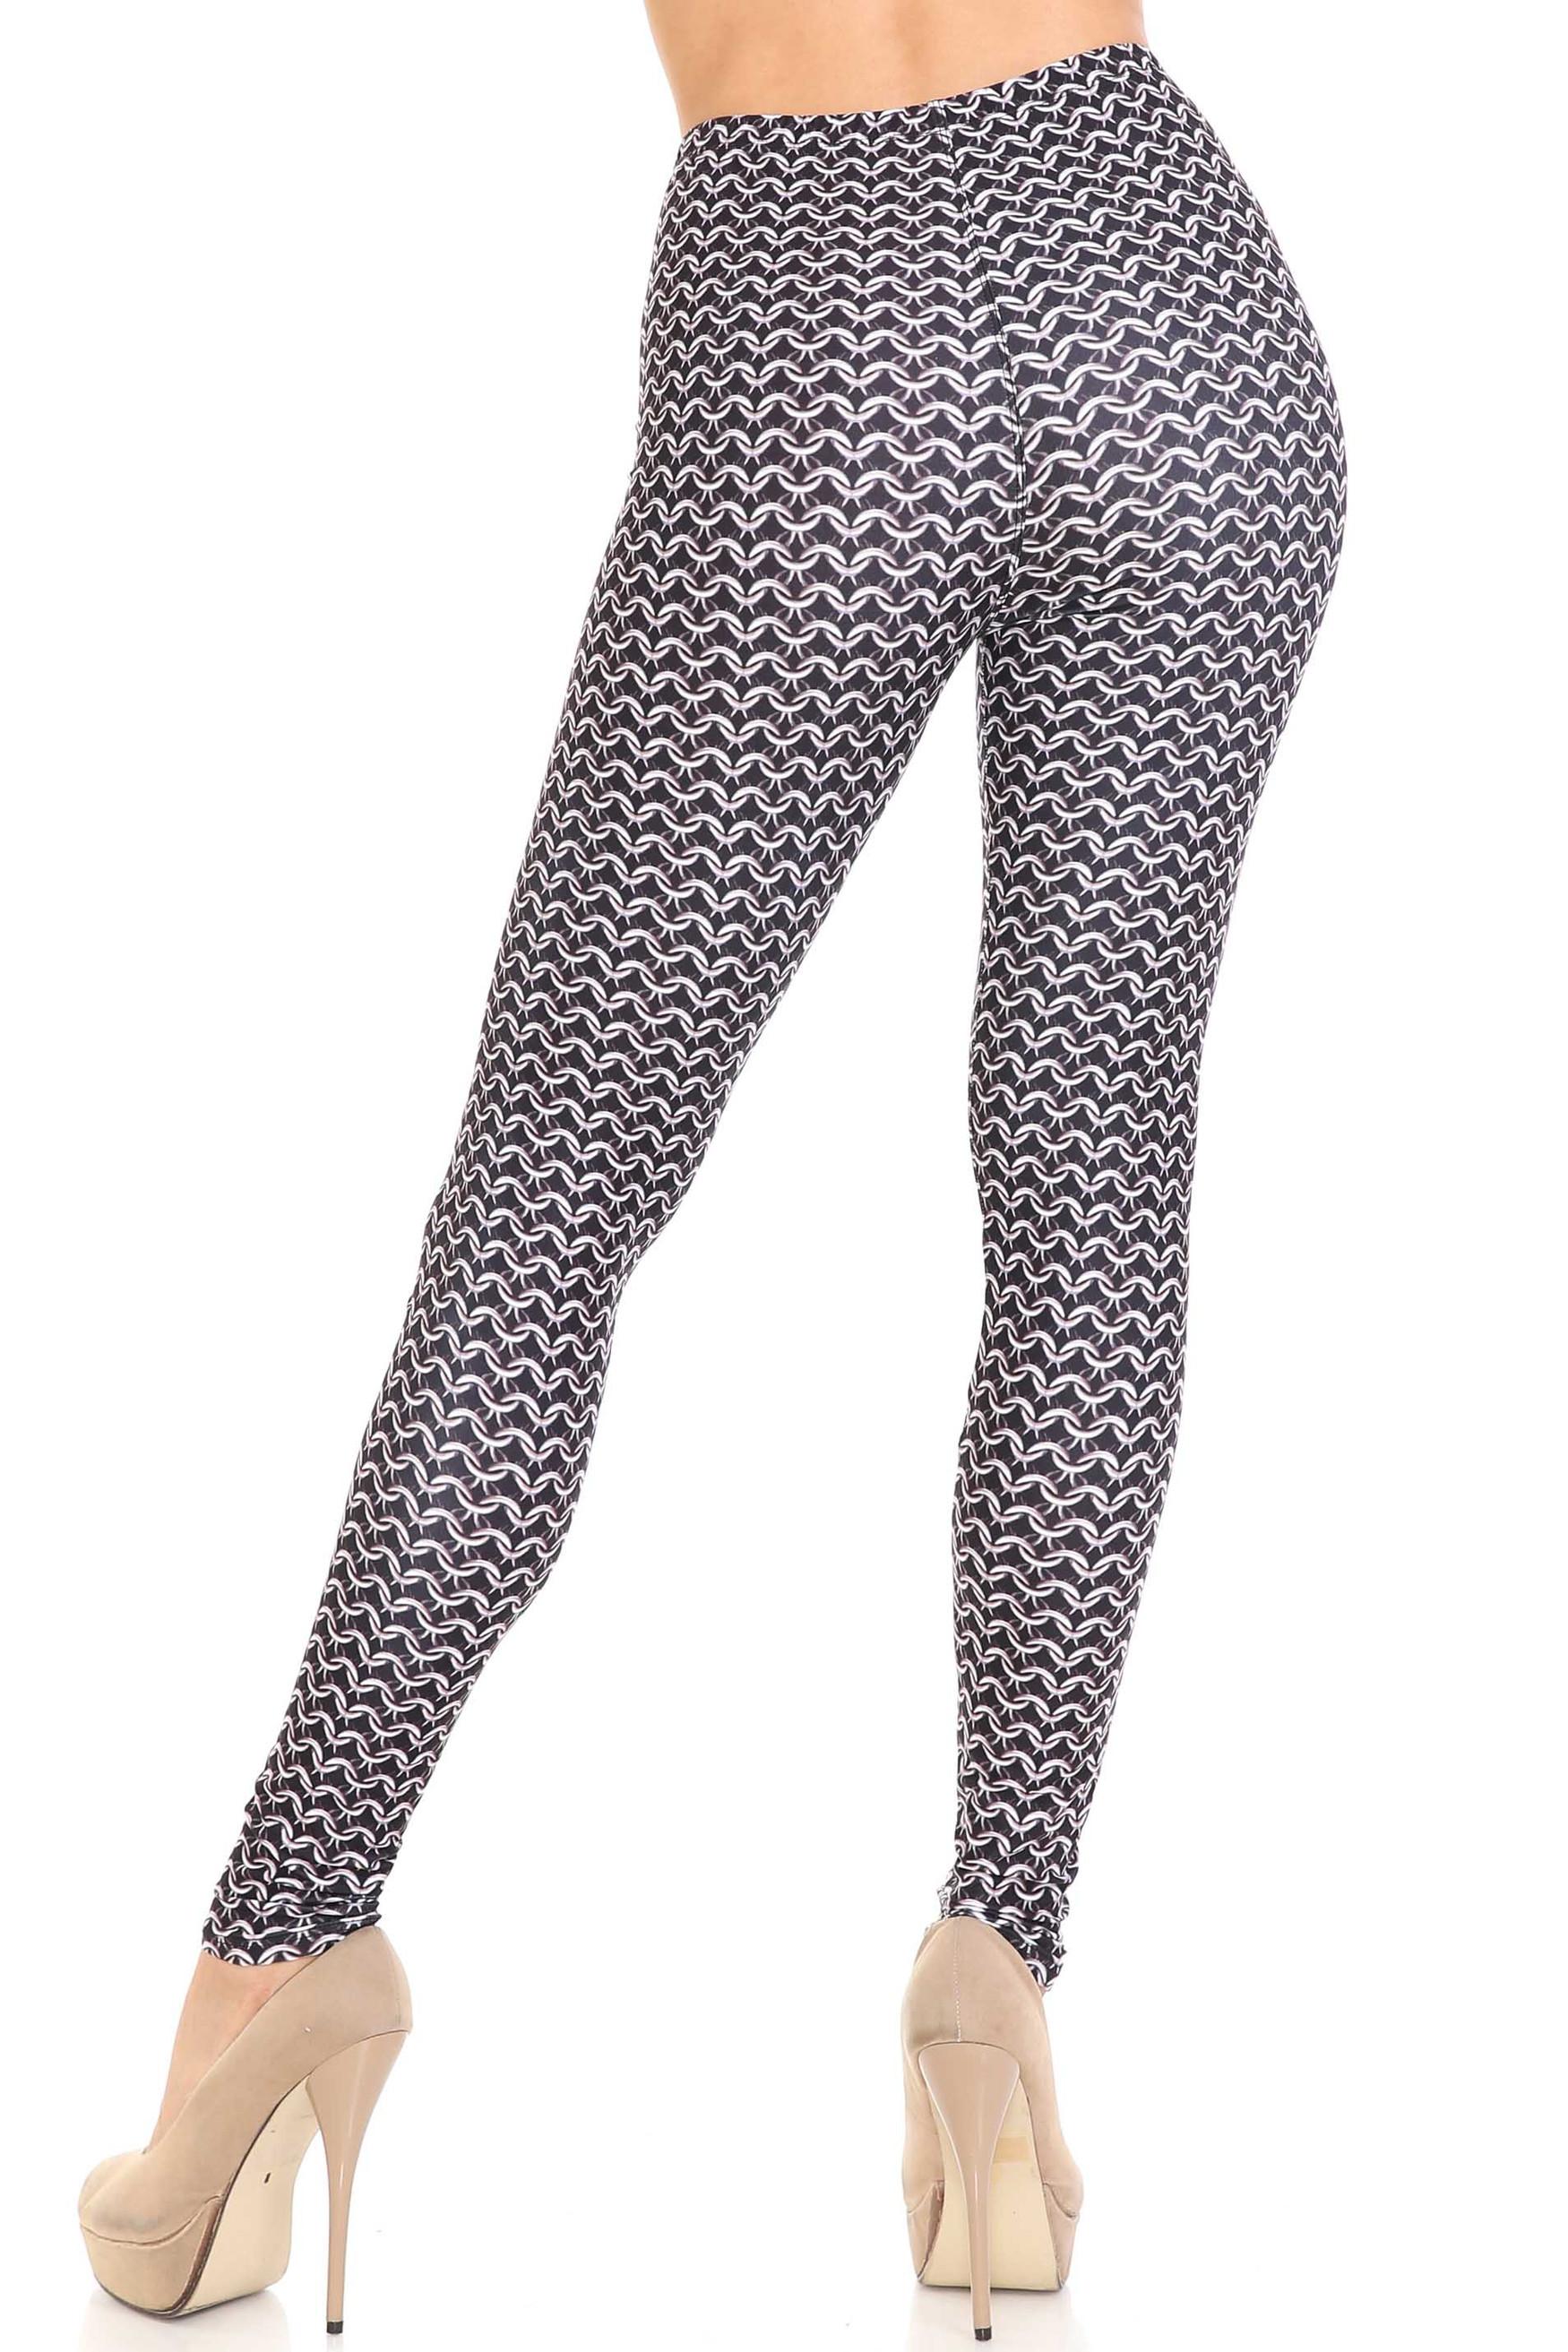 Creamy Soft Chainmail Extra Plus Size Leggings - 3X-5X - USA Fashion™